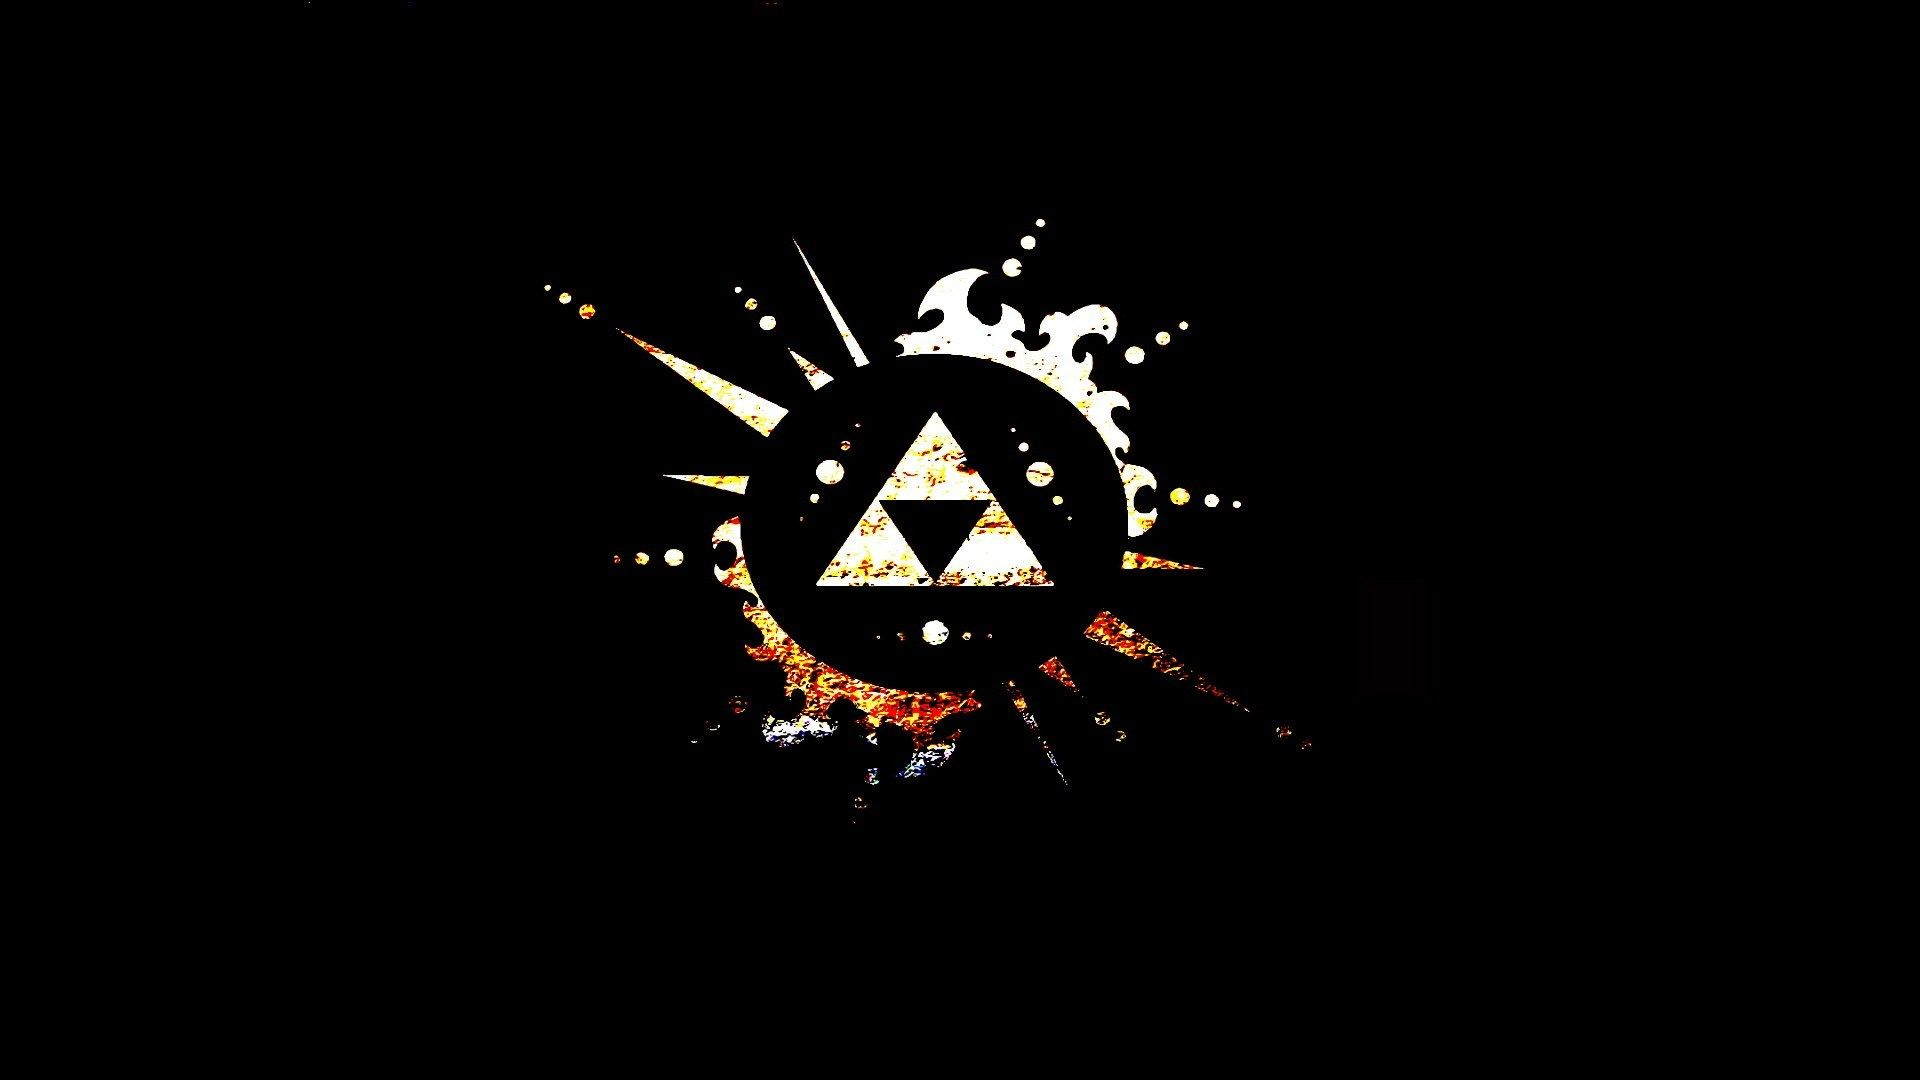 Free Download Logo Legend Of Zelda Wallpaper Hd Zelda Hd Legend Of Zelda Hd Wallpaper